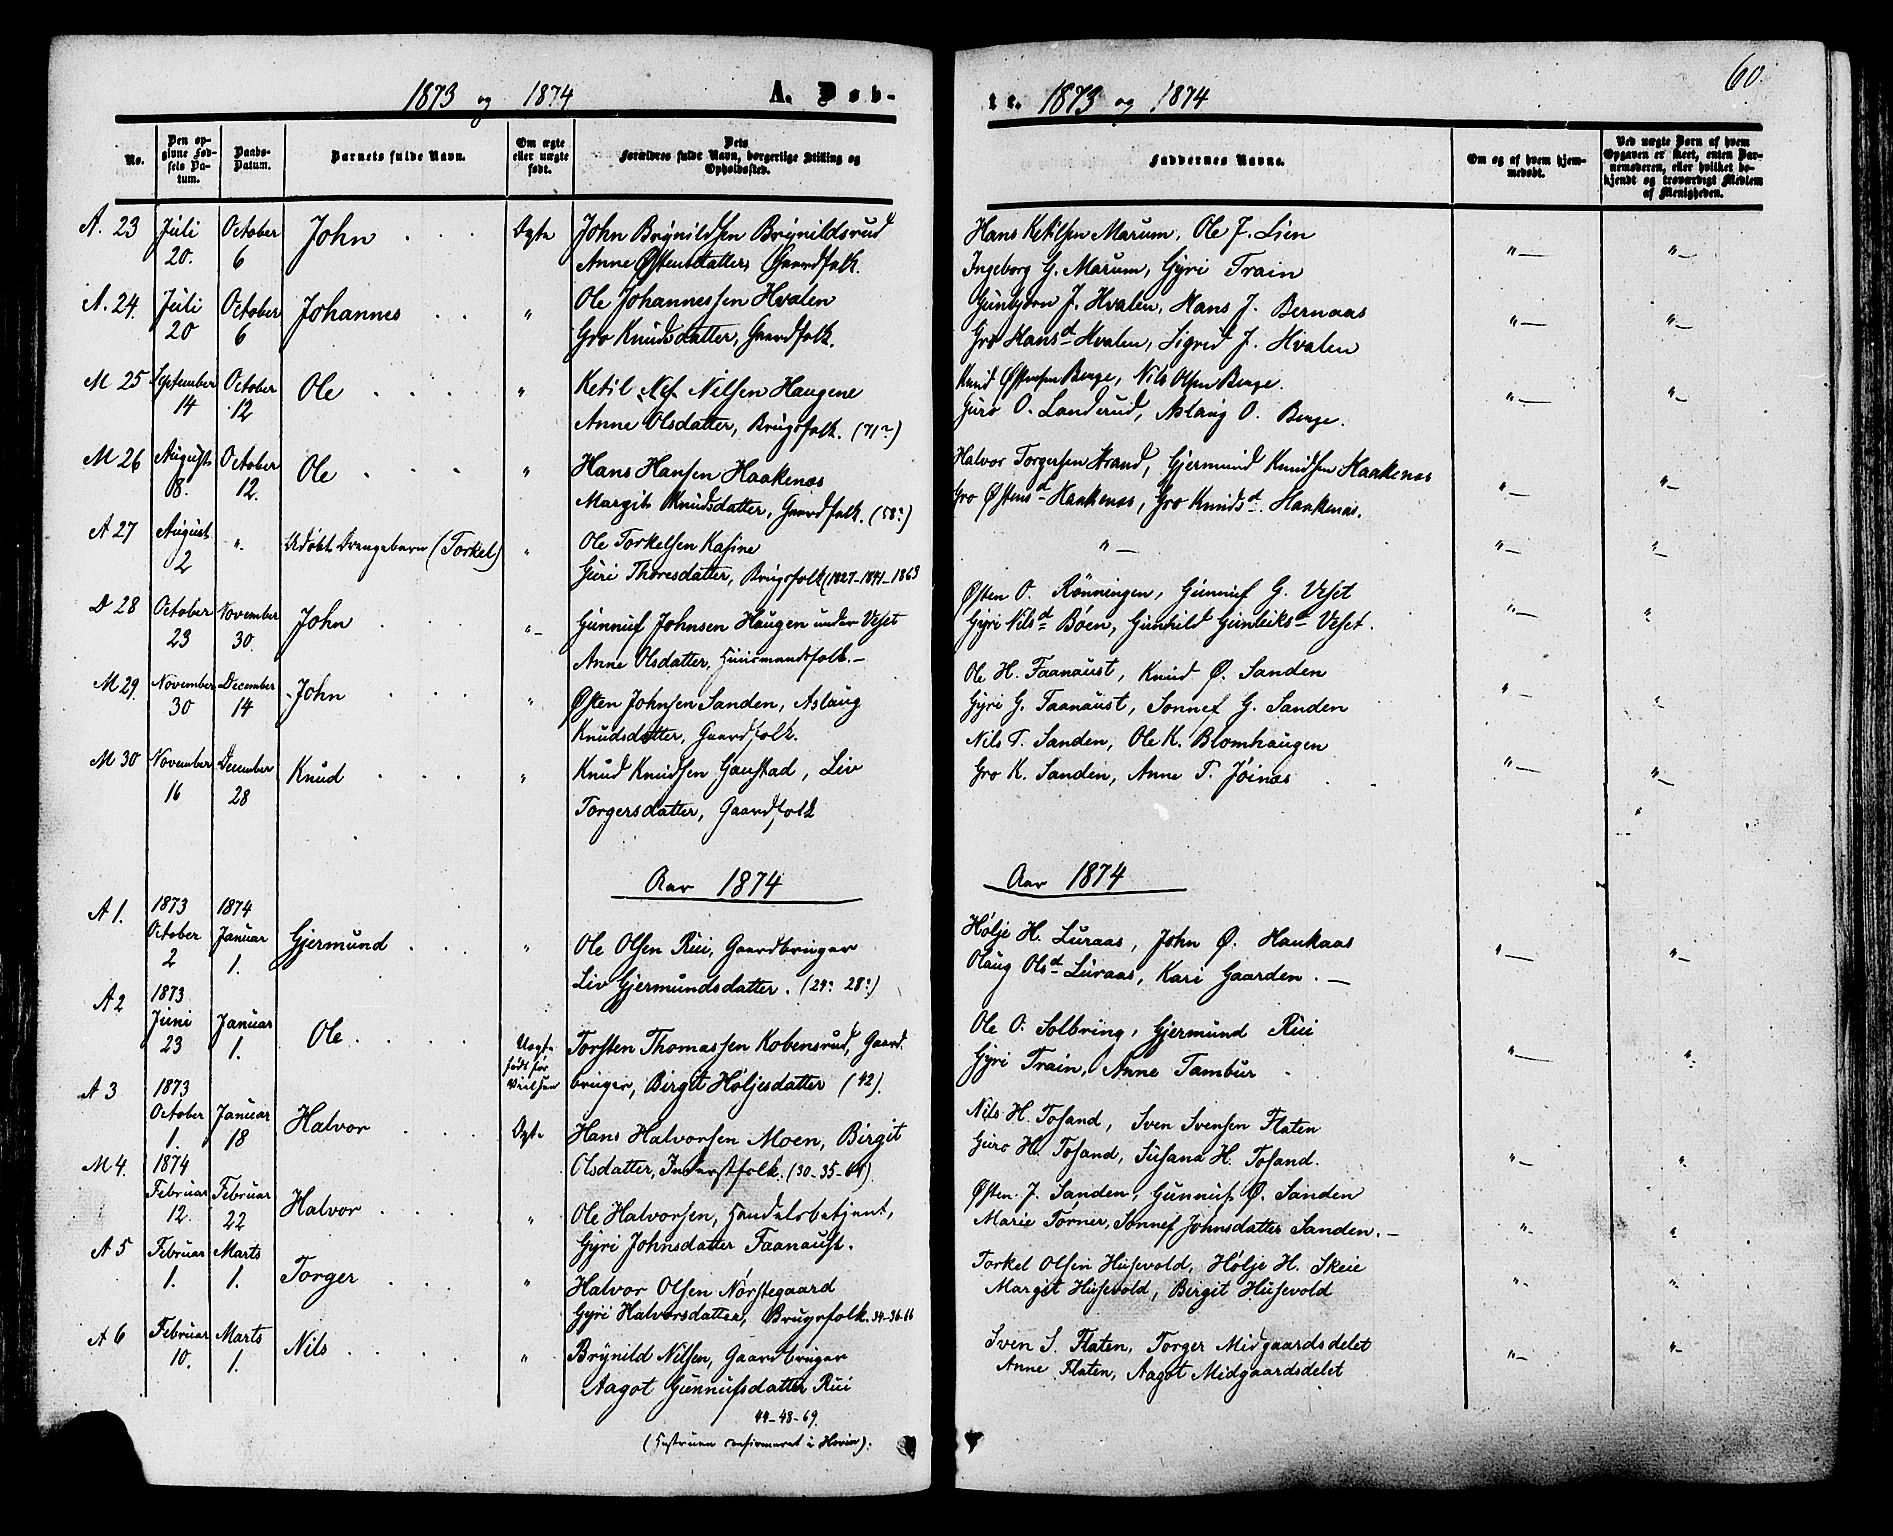 SAKO, Tinn kirkebøker, F/Fa/L0006: Ministerialbok nr. I 6, 1857-1878, s. 60